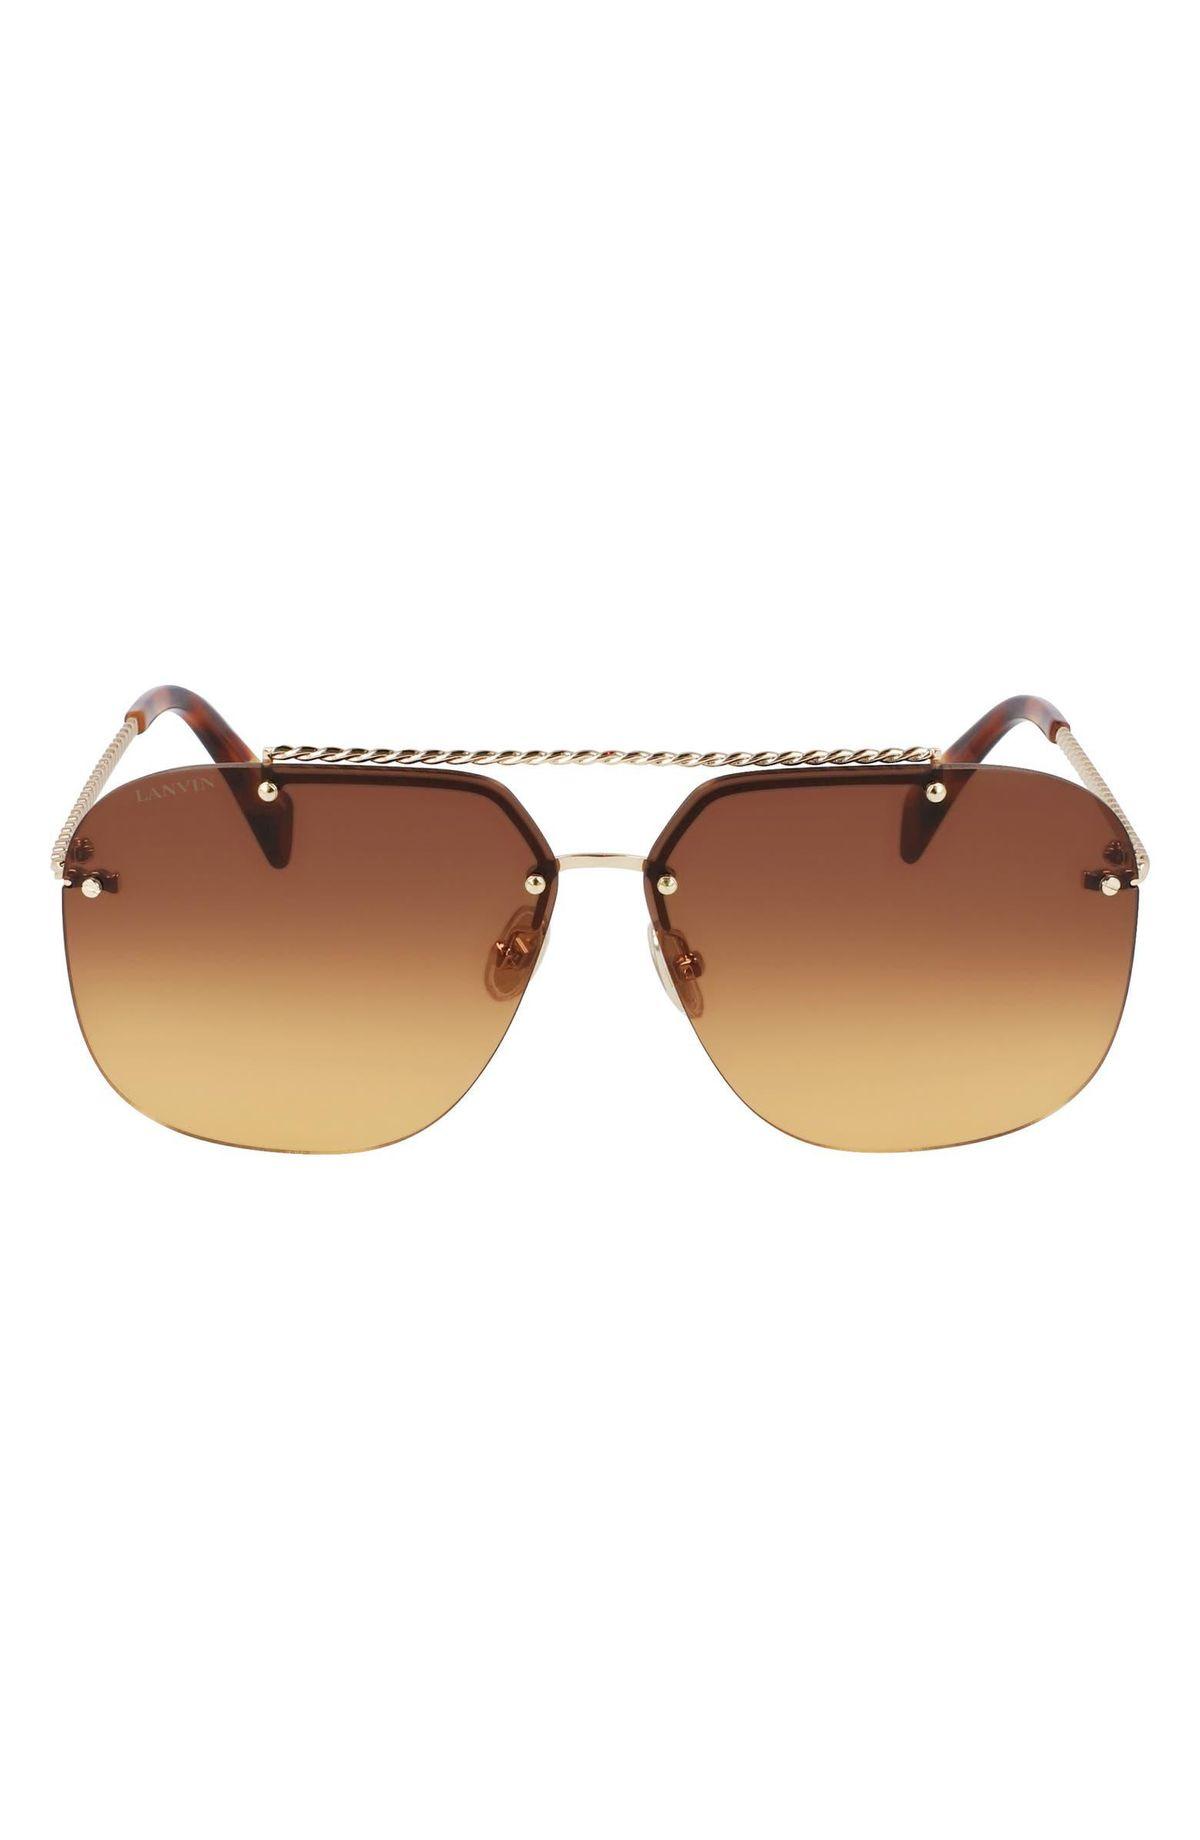 Babe 64mm Gradient Oversize Aviator Sunglasses